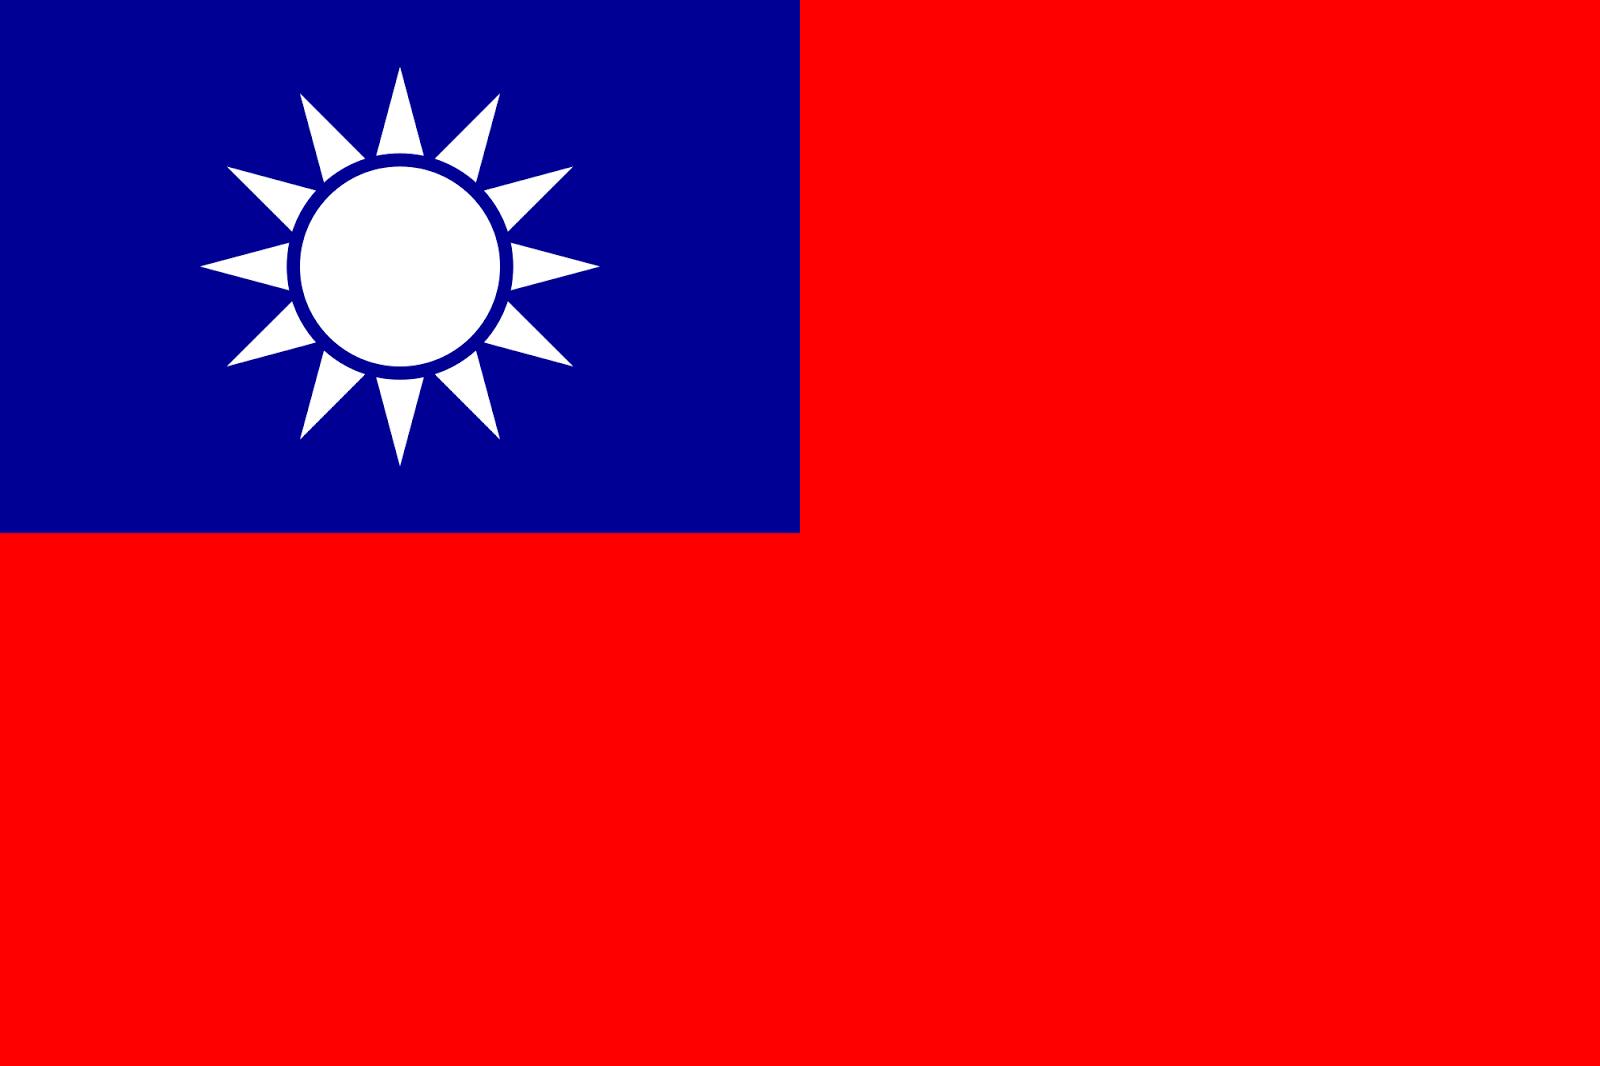 http://carbrandsincurrentproduction.blogspot.com.es/search/label/Taiwan